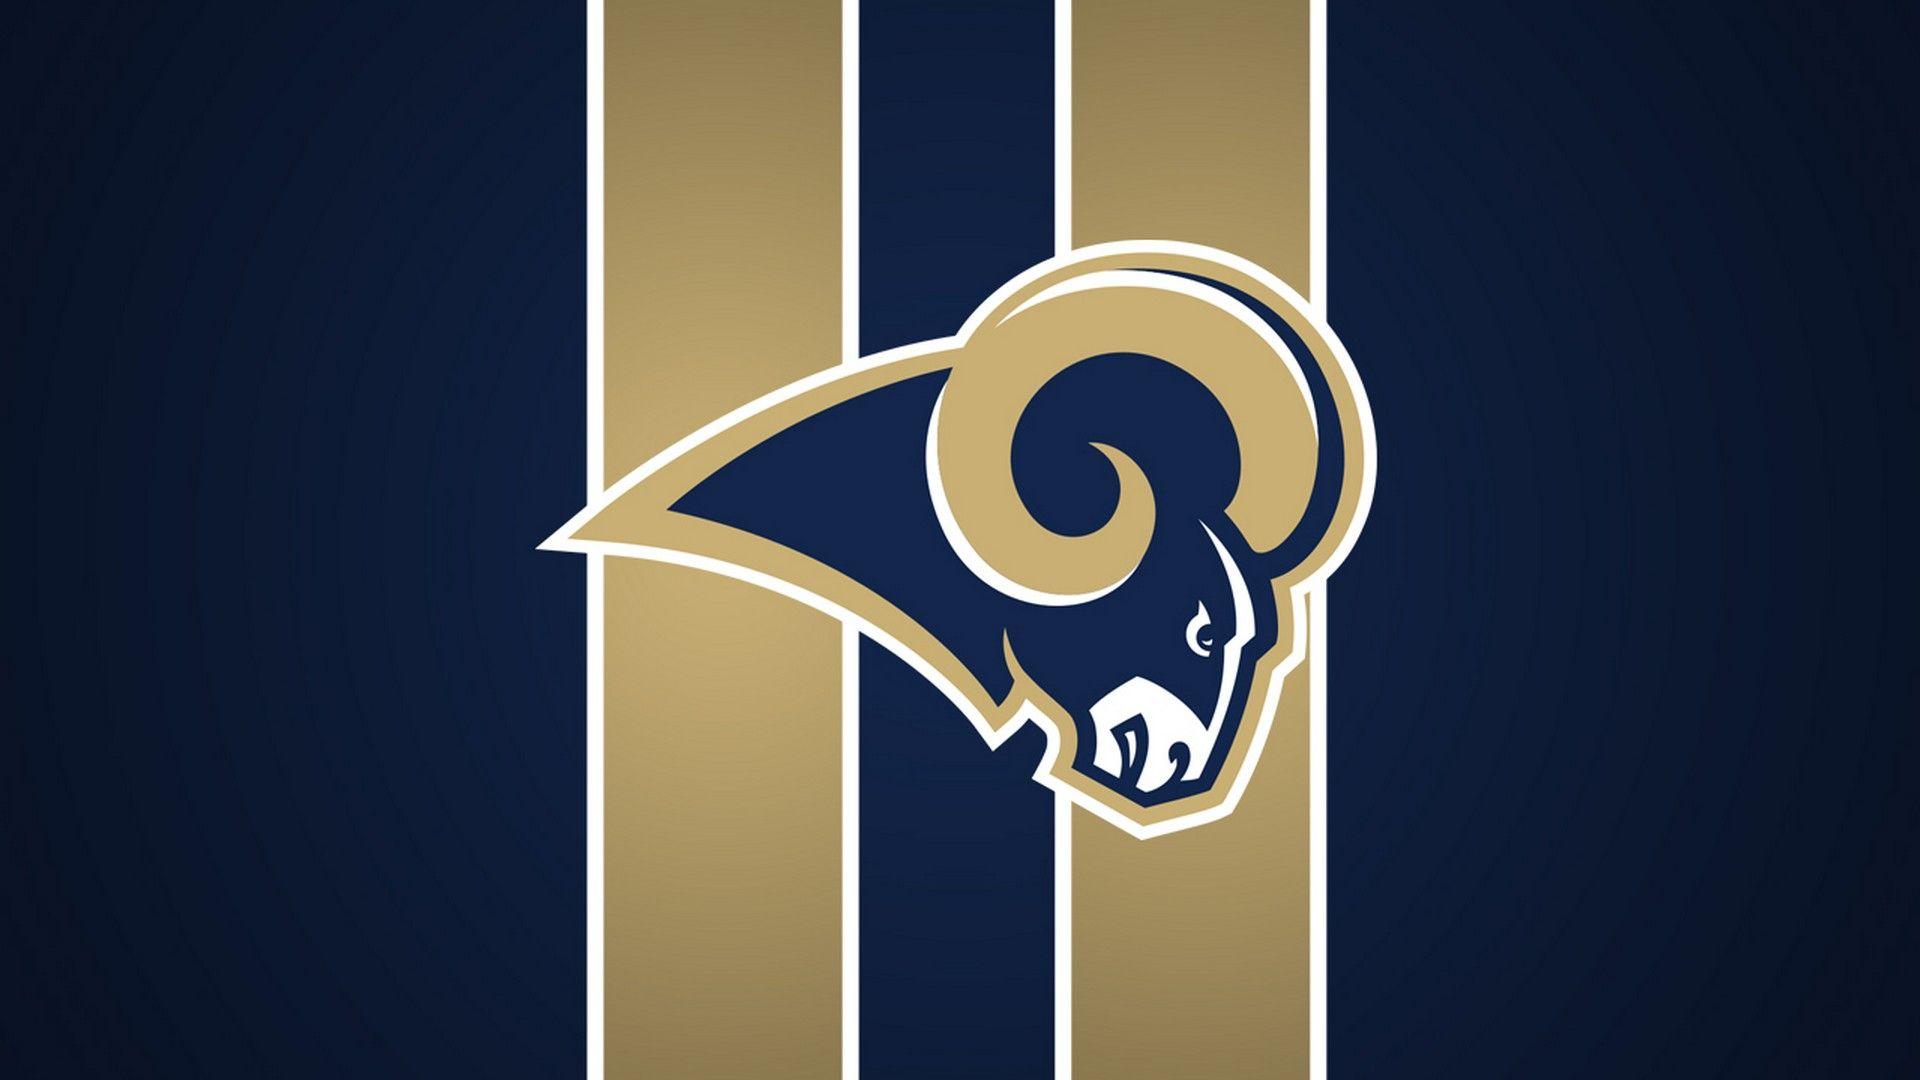 Los Angeles Rams For Mac 2020 Nfl Football Wallpapers St Louis Rams Los Angeles Rams Nfl Football Wallpaper